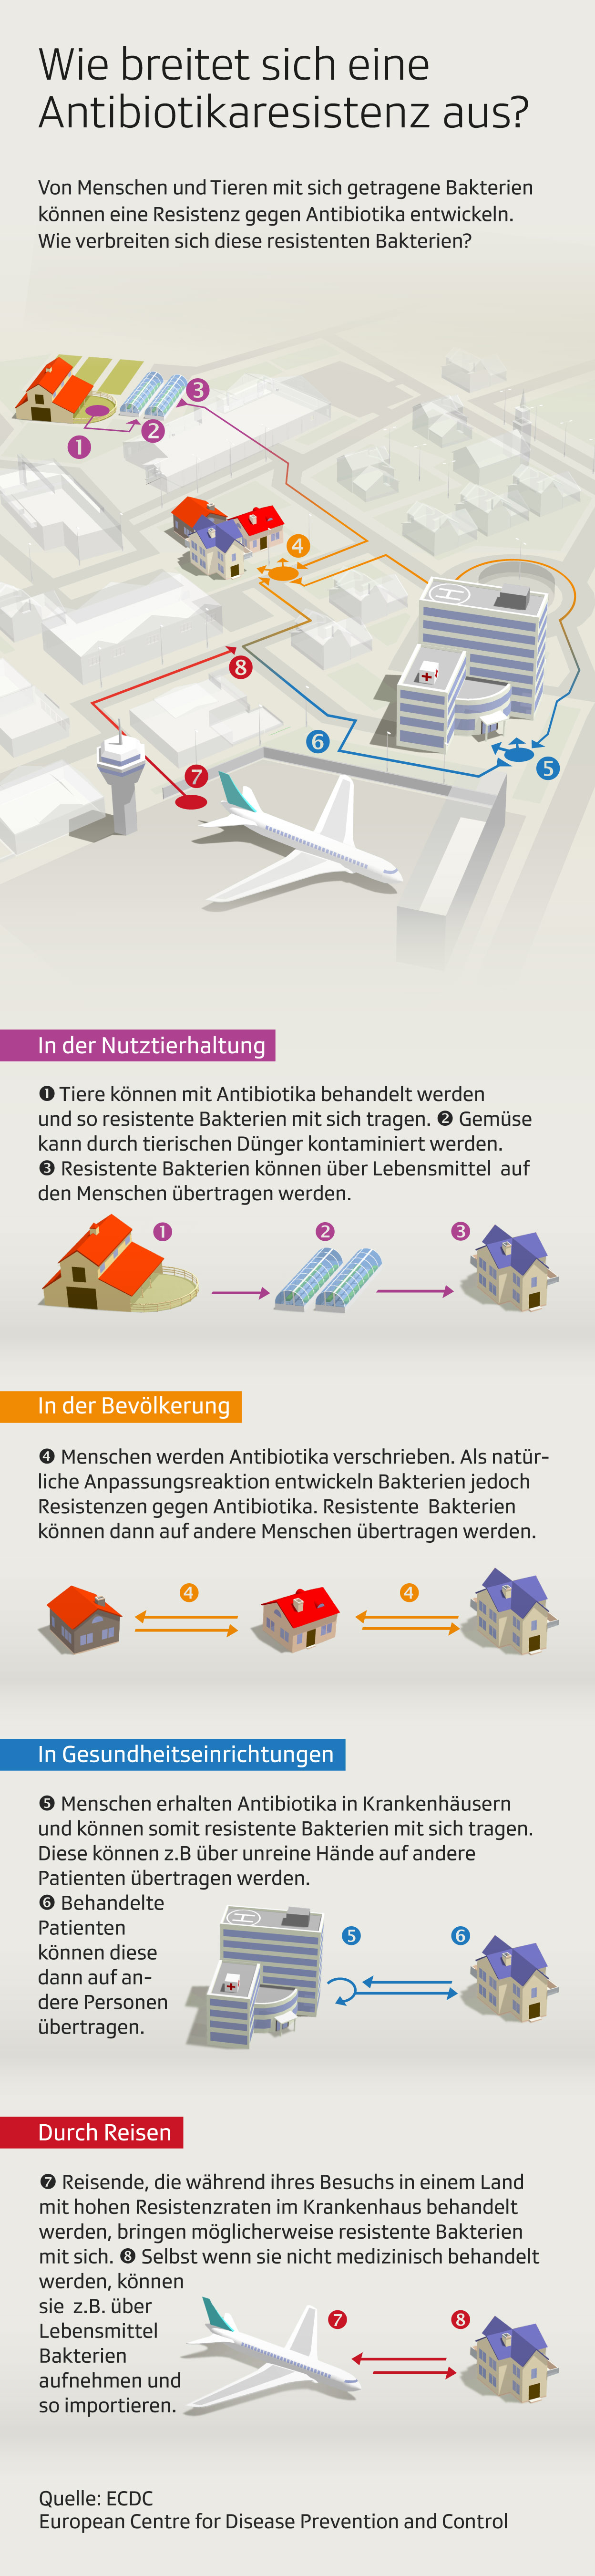 Grafik Antibiotikaresistenz